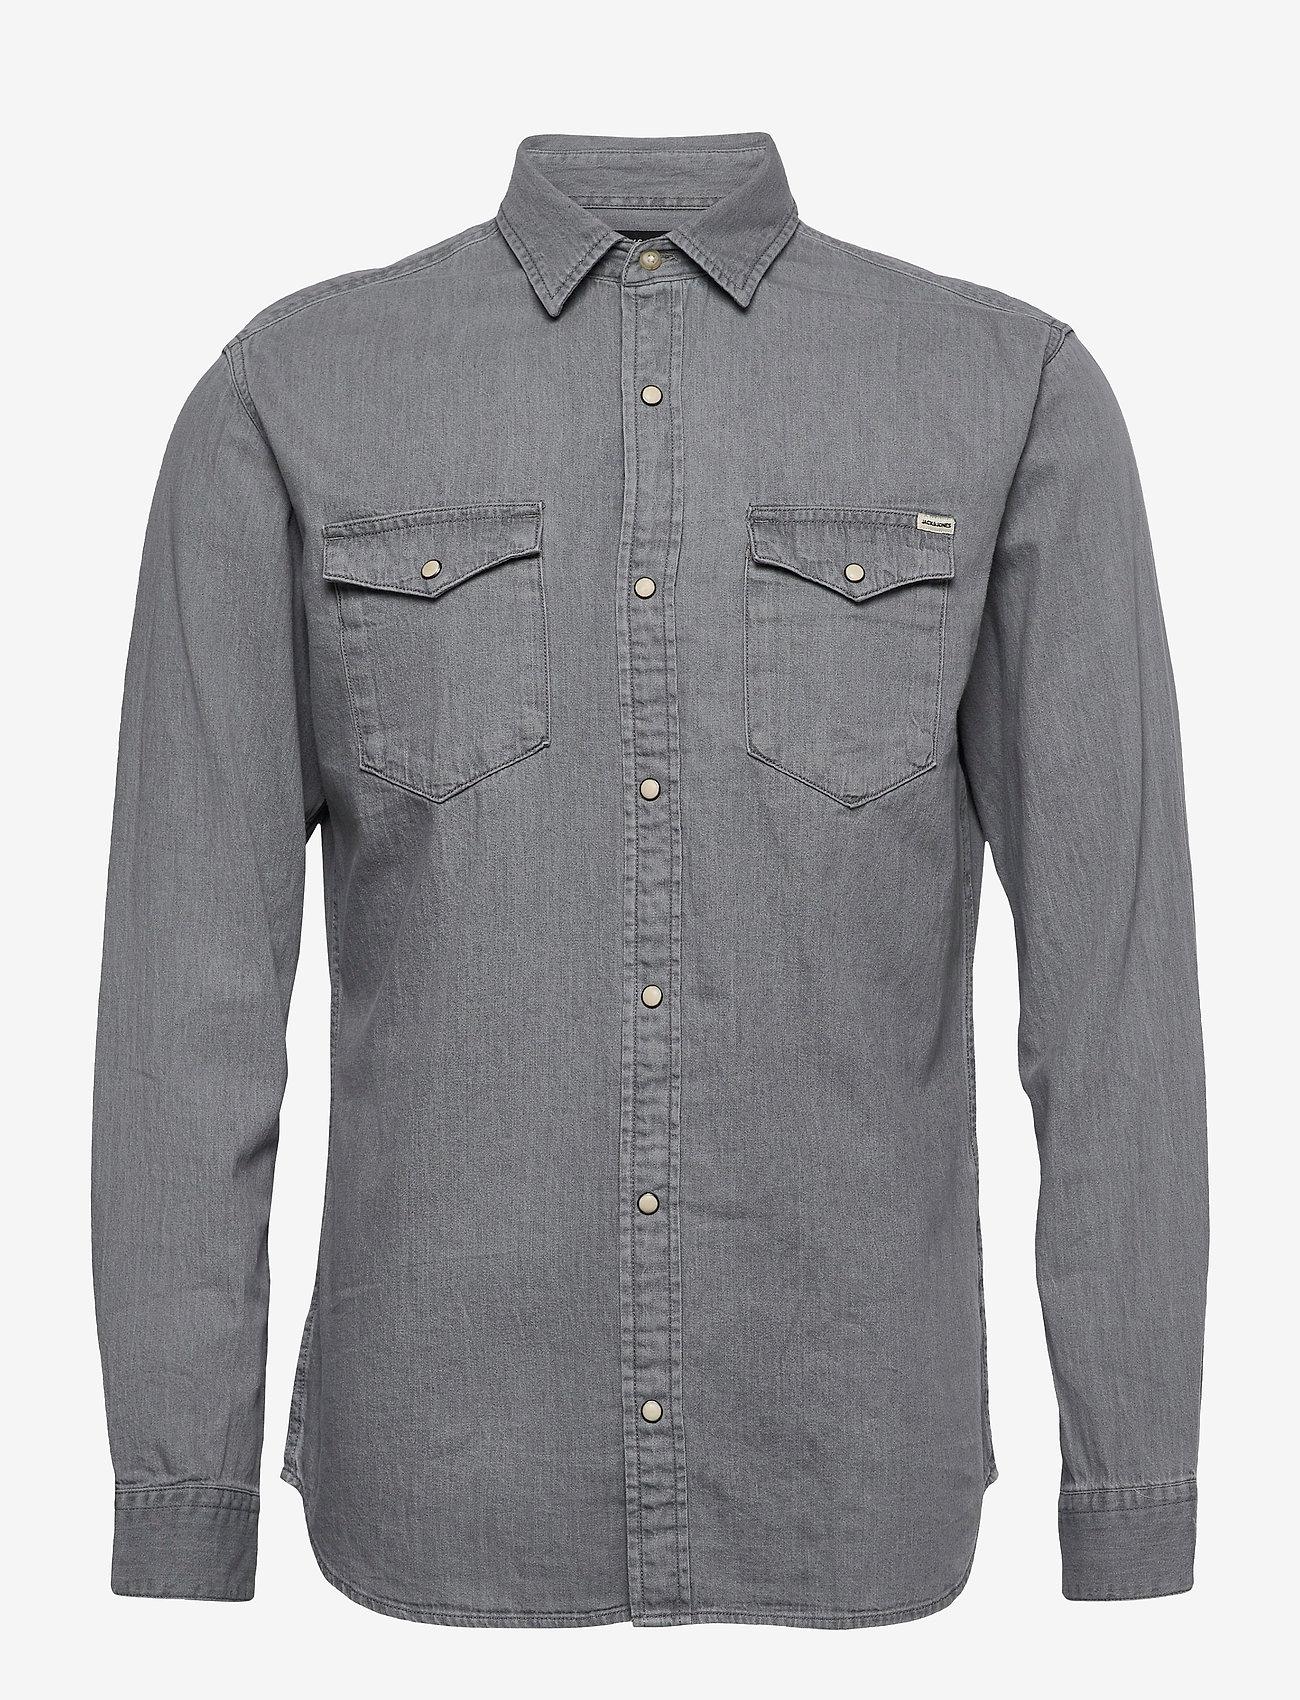 Jack & Jones - JJESHERIDAN SHIRT L/S - jeansskjortor - light grey denim - 0